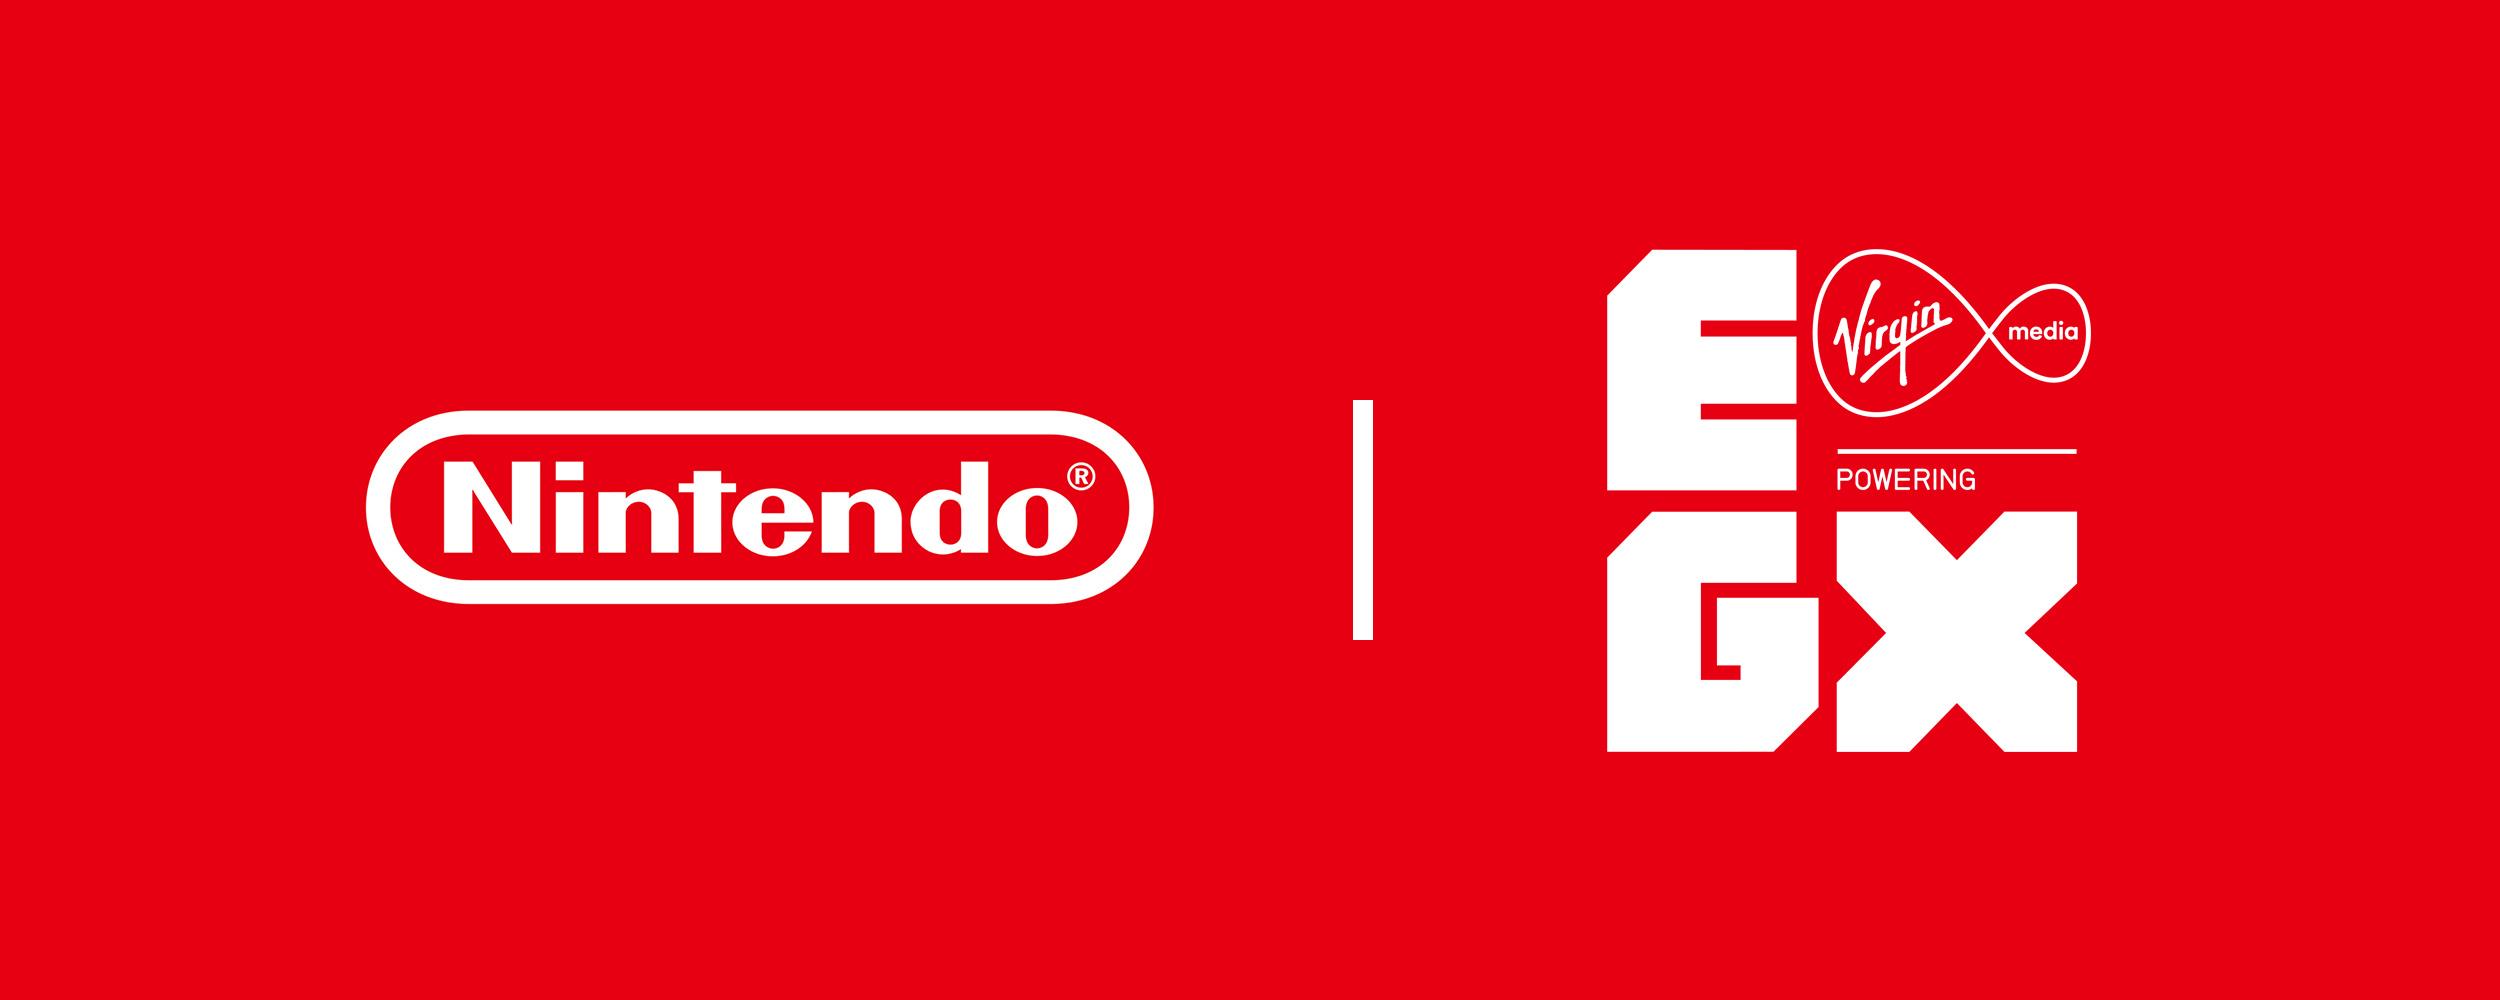 Nintendo Stand EGX 2018